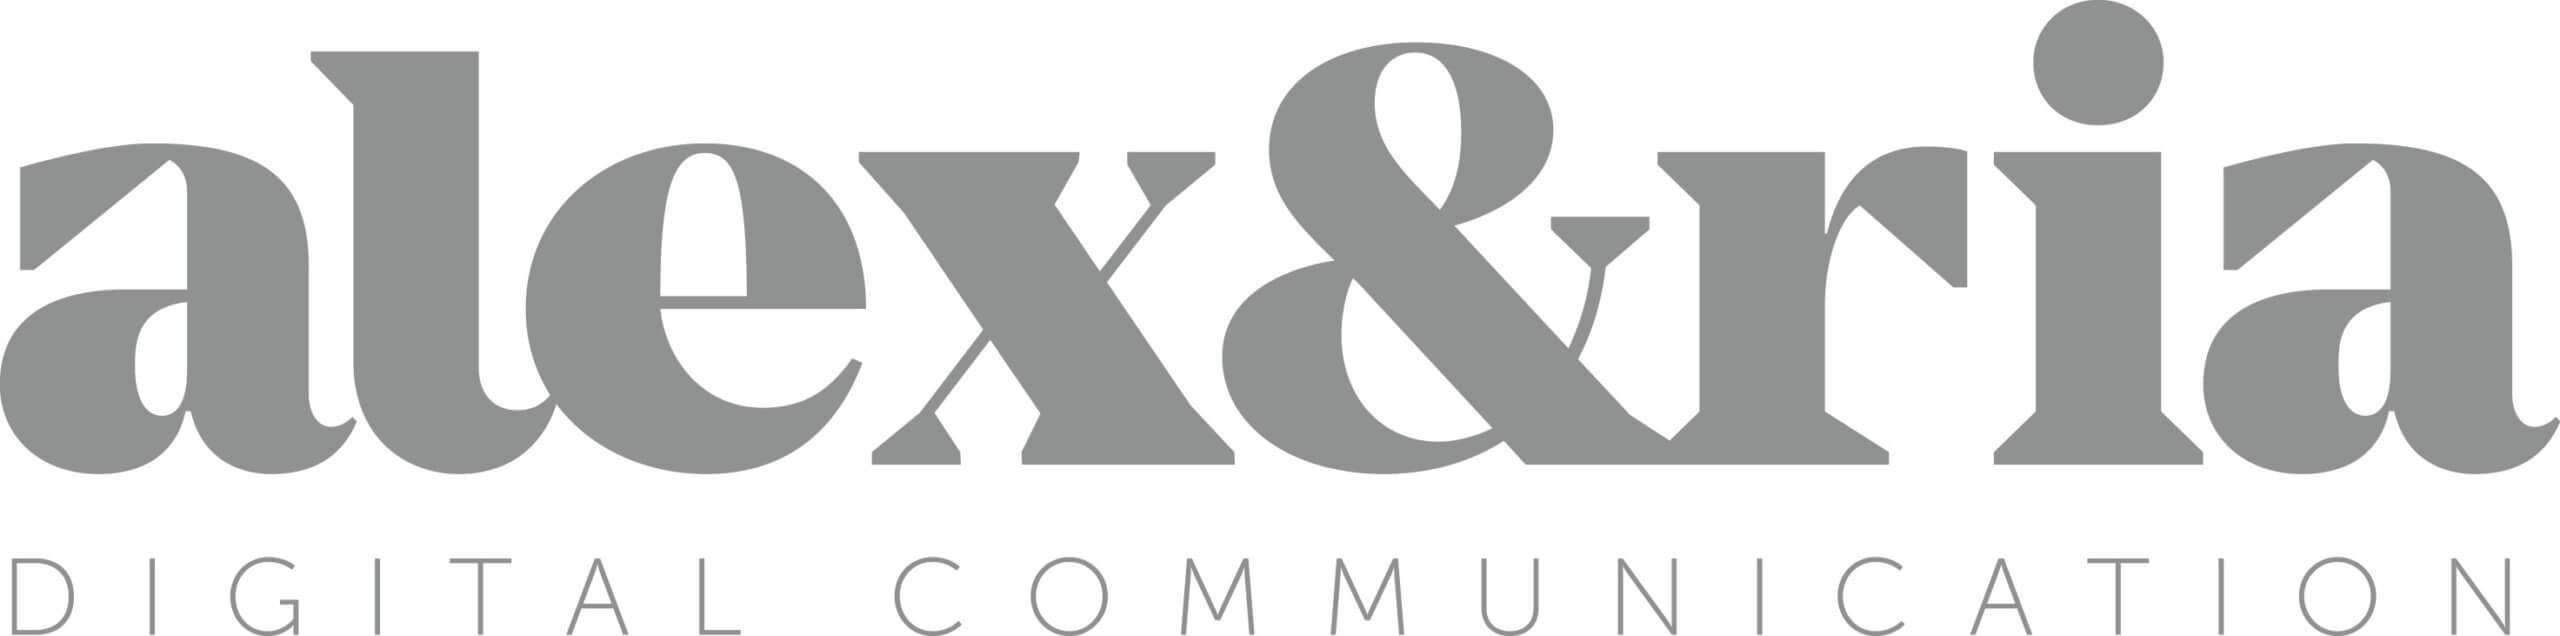 alex&ria digital communication